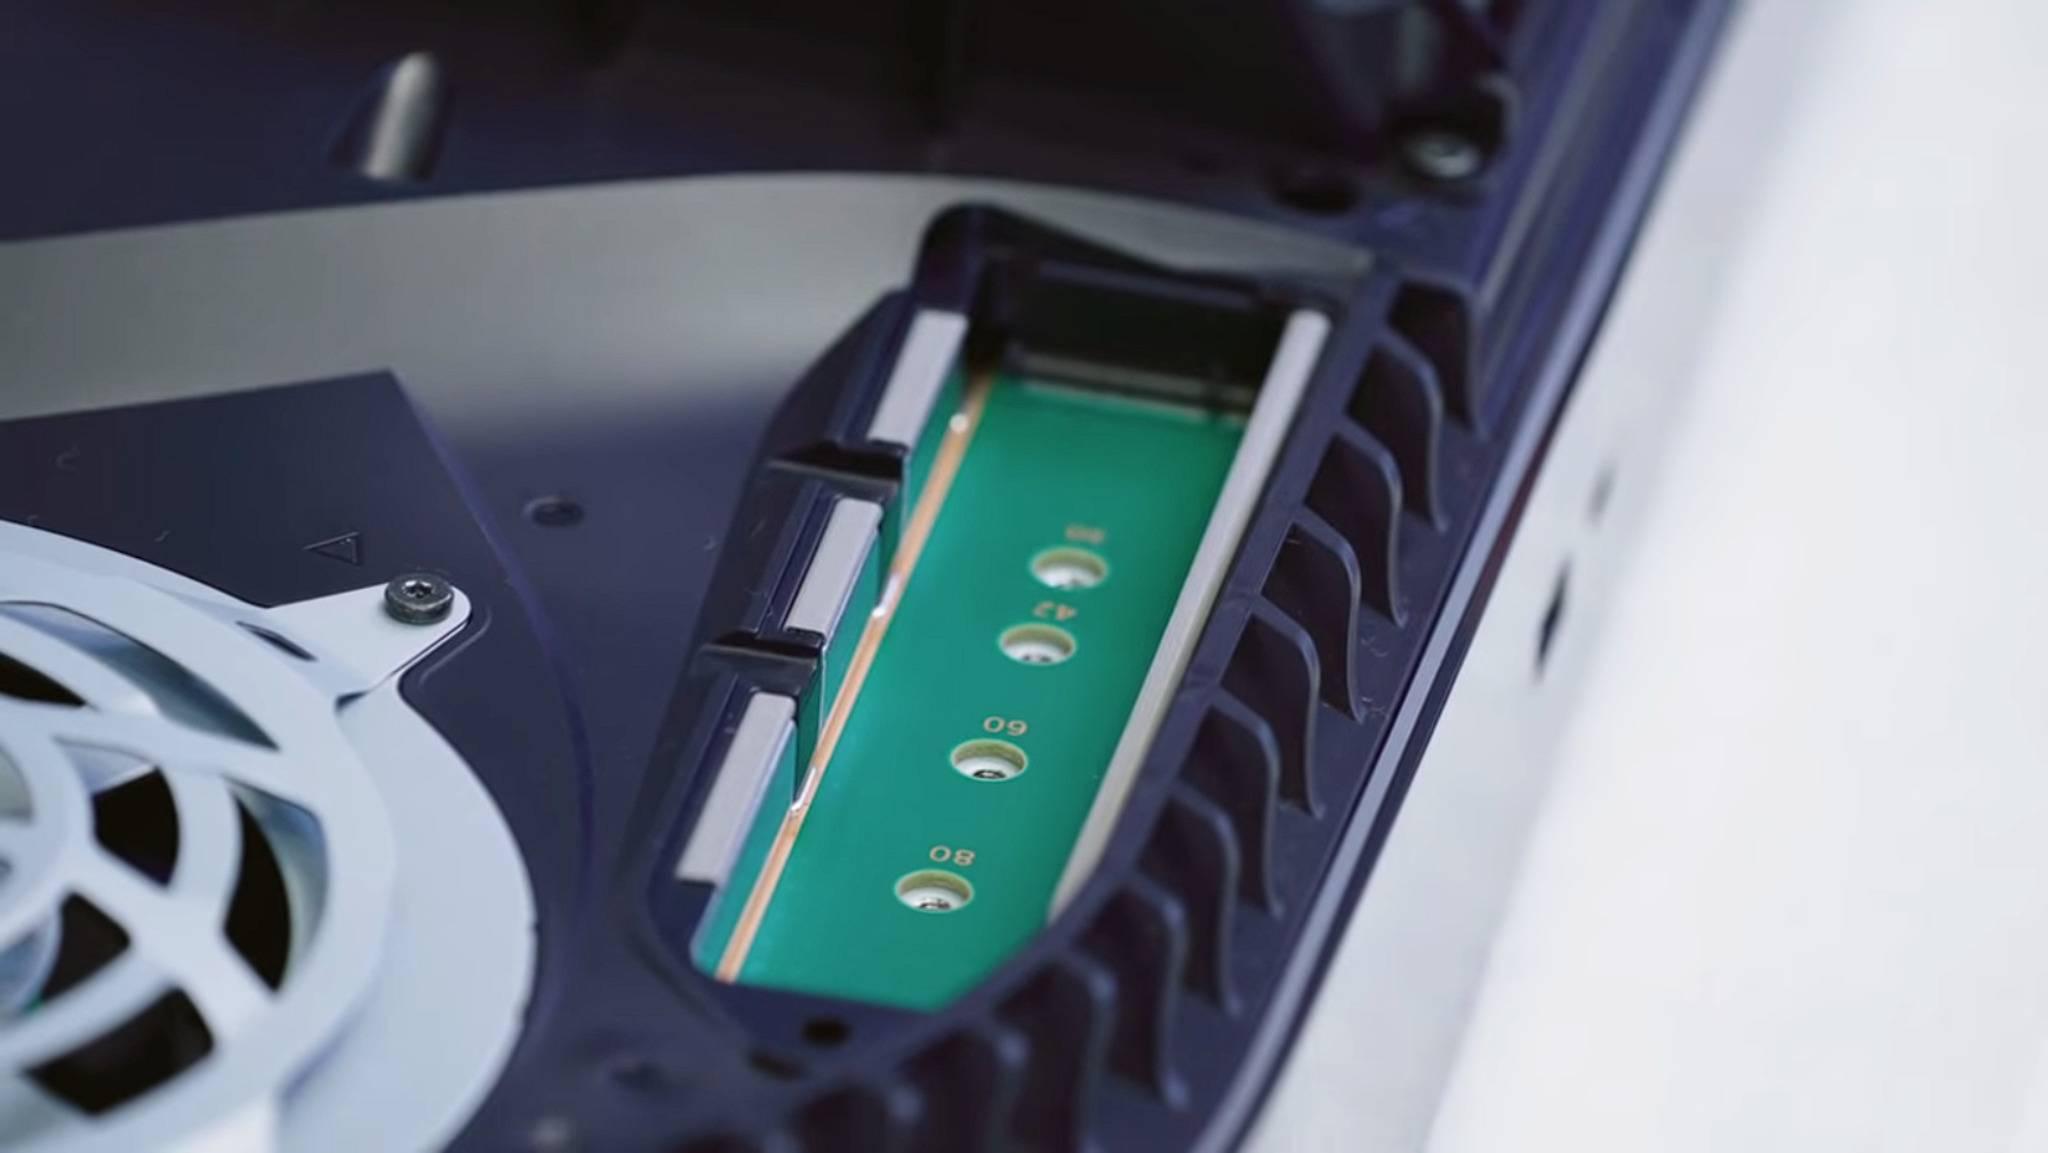 PS5-nvme-ssd-slot